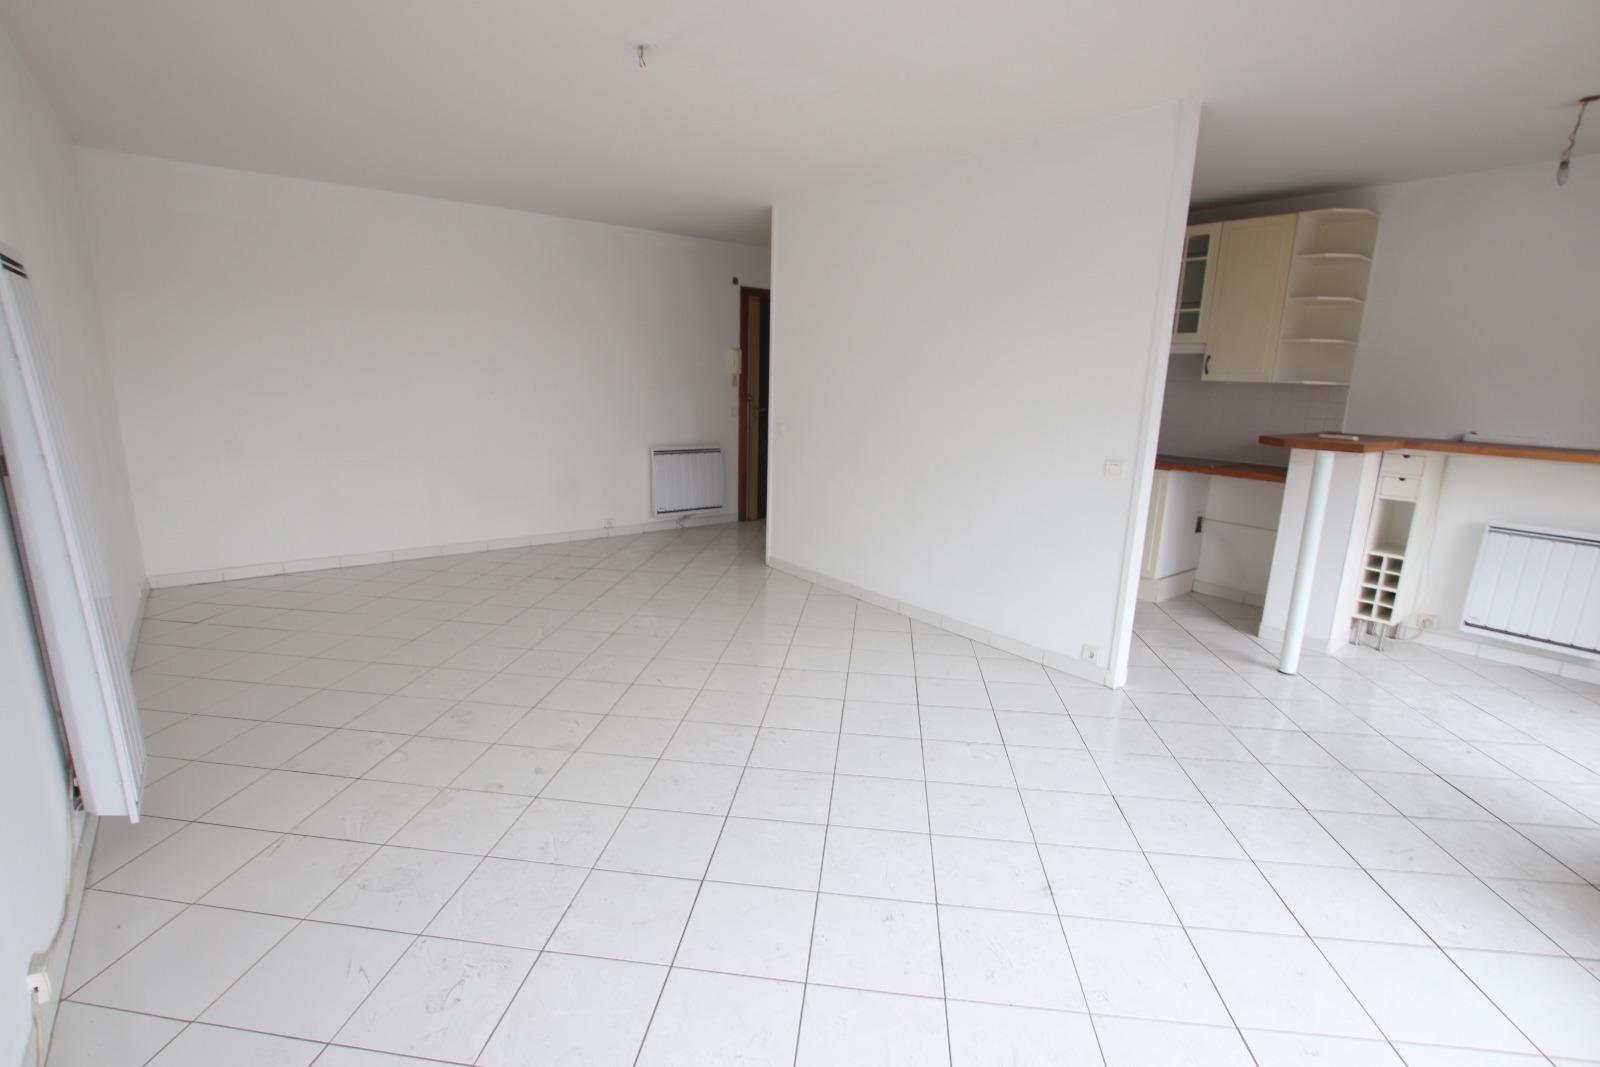 vente 13008 marseille prado michelet t3 avec balcon terrasse cabinet savonitto. Black Bedroom Furniture Sets. Home Design Ideas